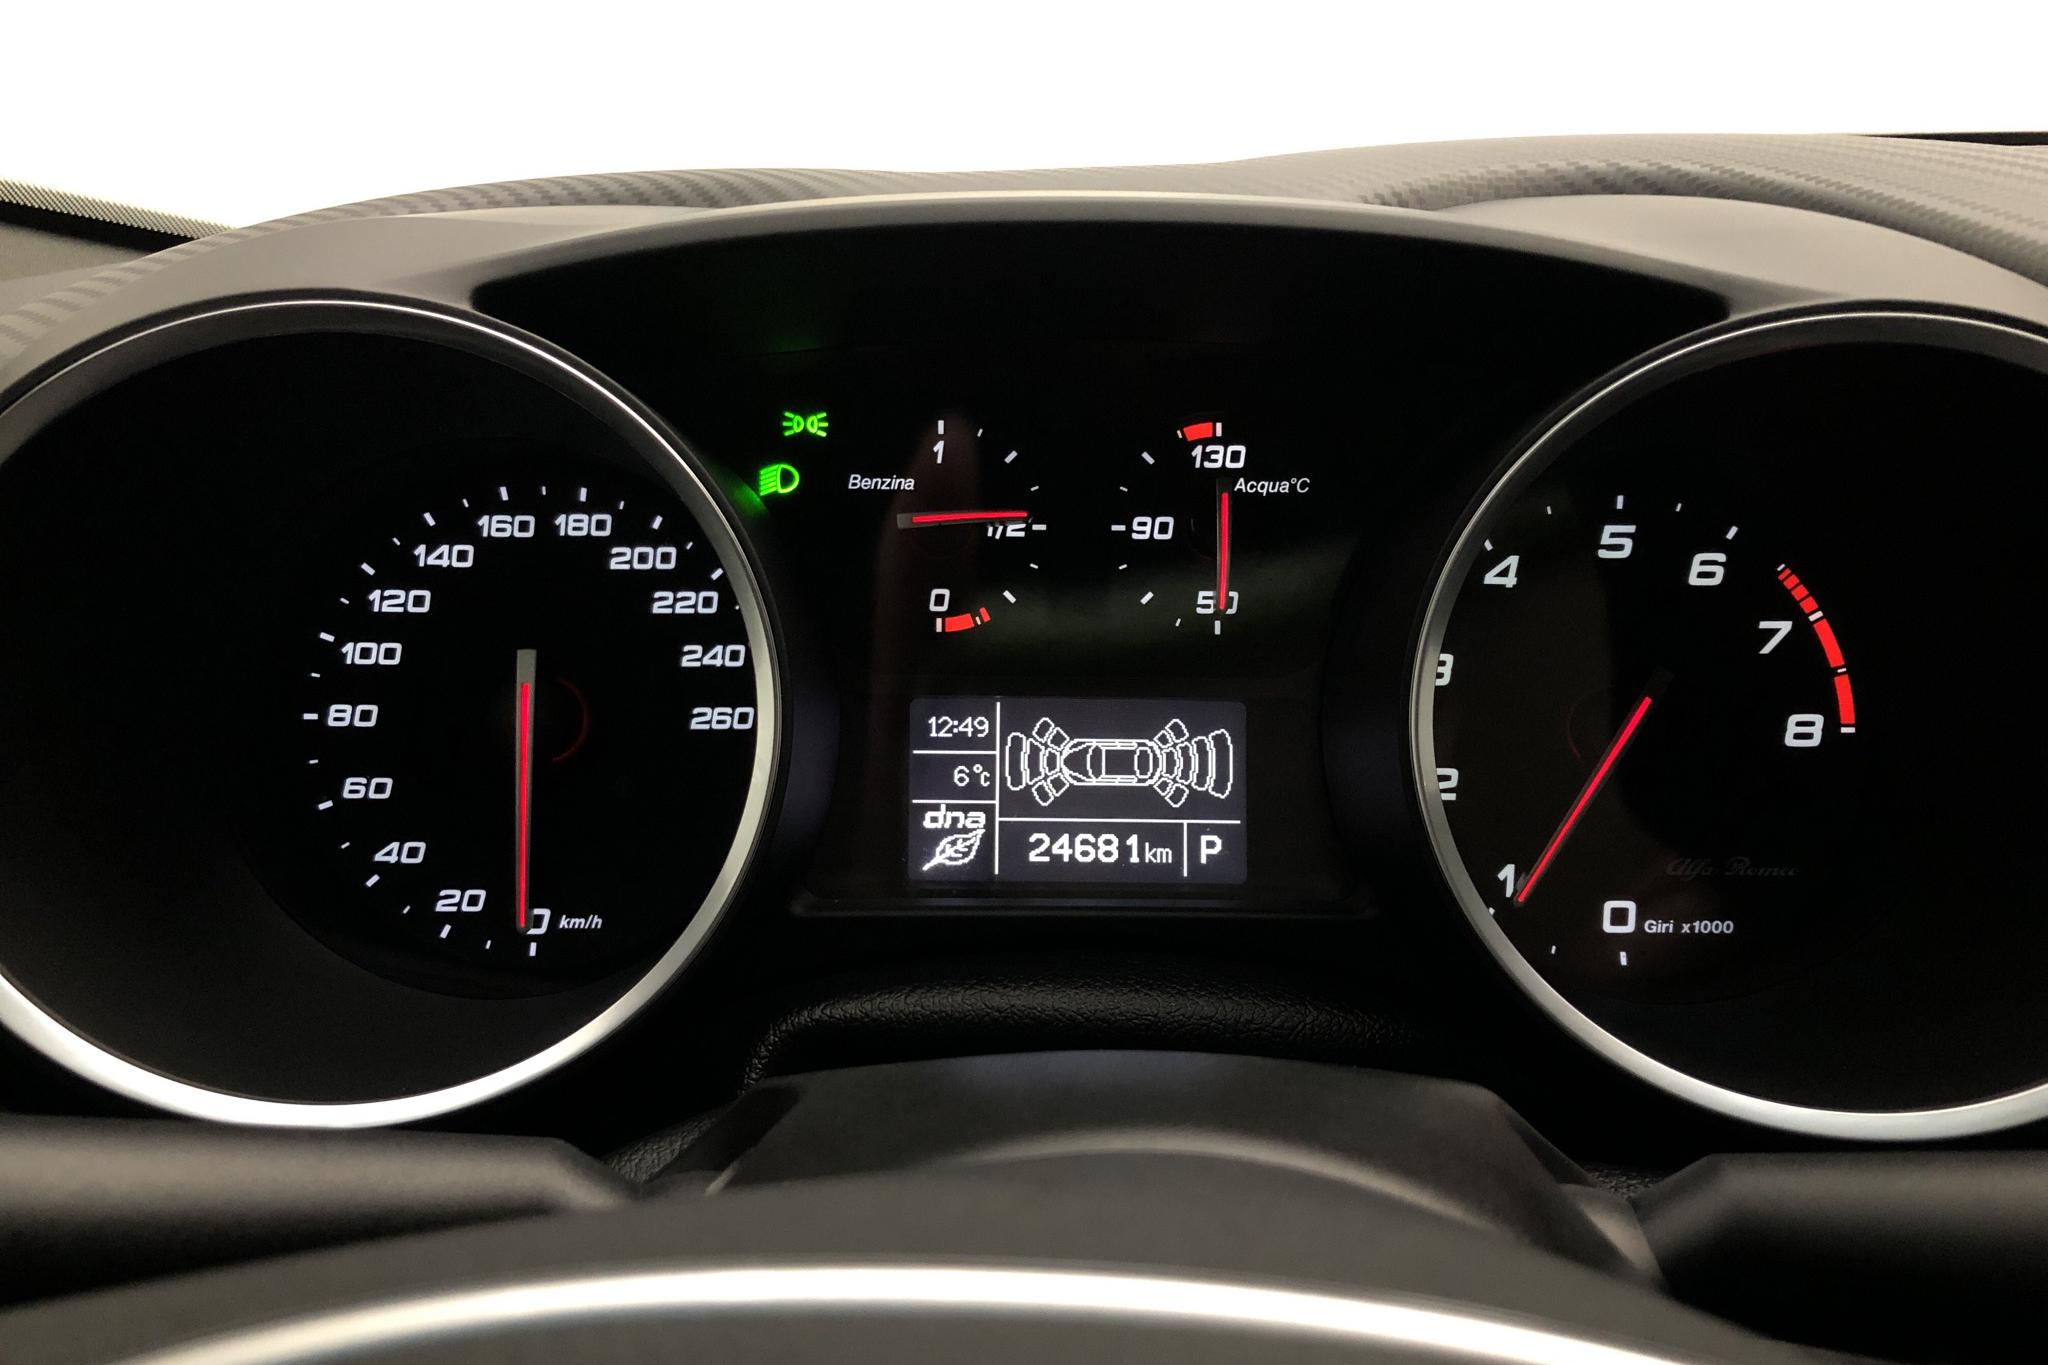 Alfa Romeo Giulietta 1.7 (240hk) - 24 680 km - Automatic - white - 2018